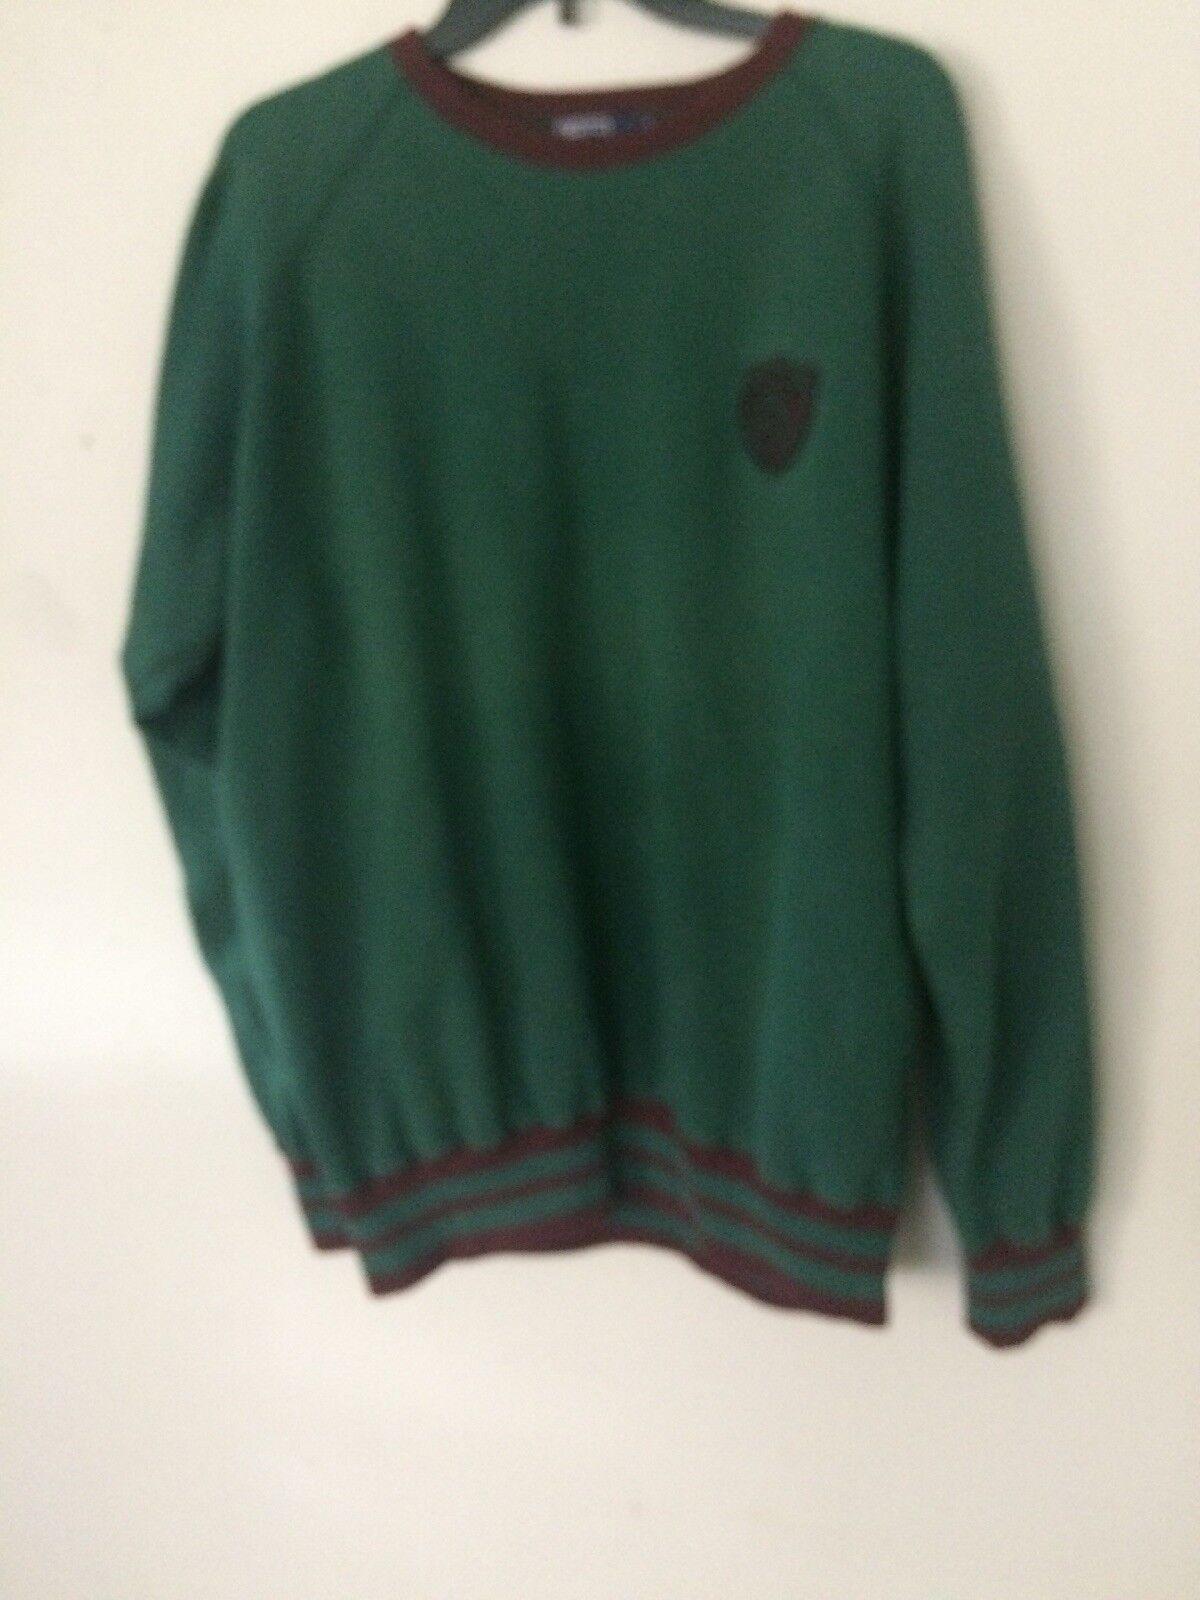 Vtg 80s 90s Polo Ralph Lauren RLPC Green Sweatshi… - image 1